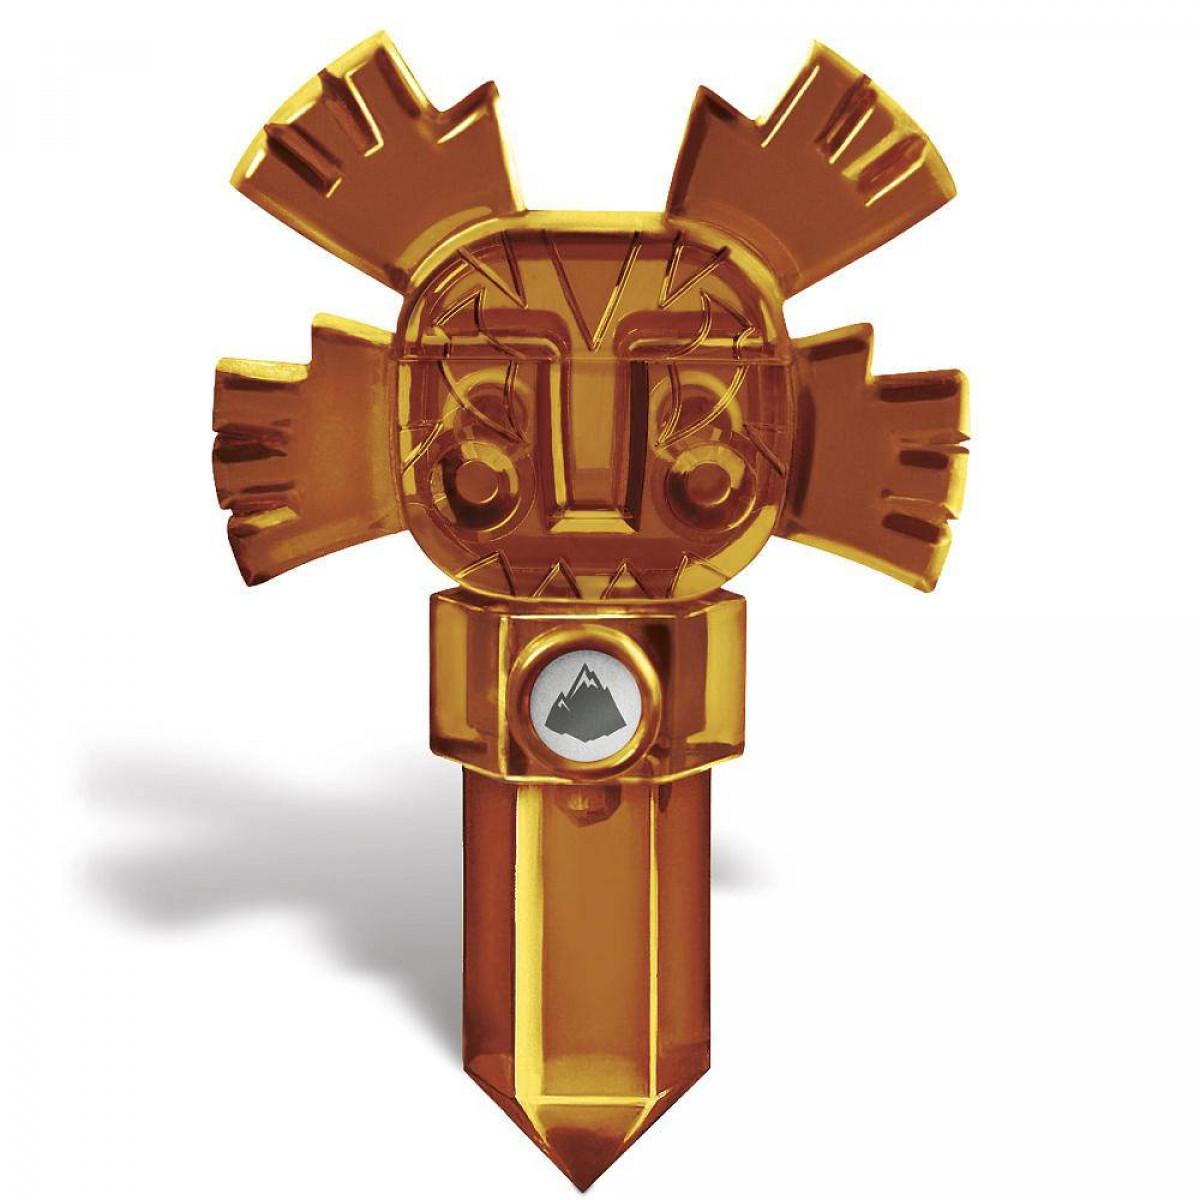 Skylanders Trap Team - Earth Totem (Spinning Sandstorm) Trap